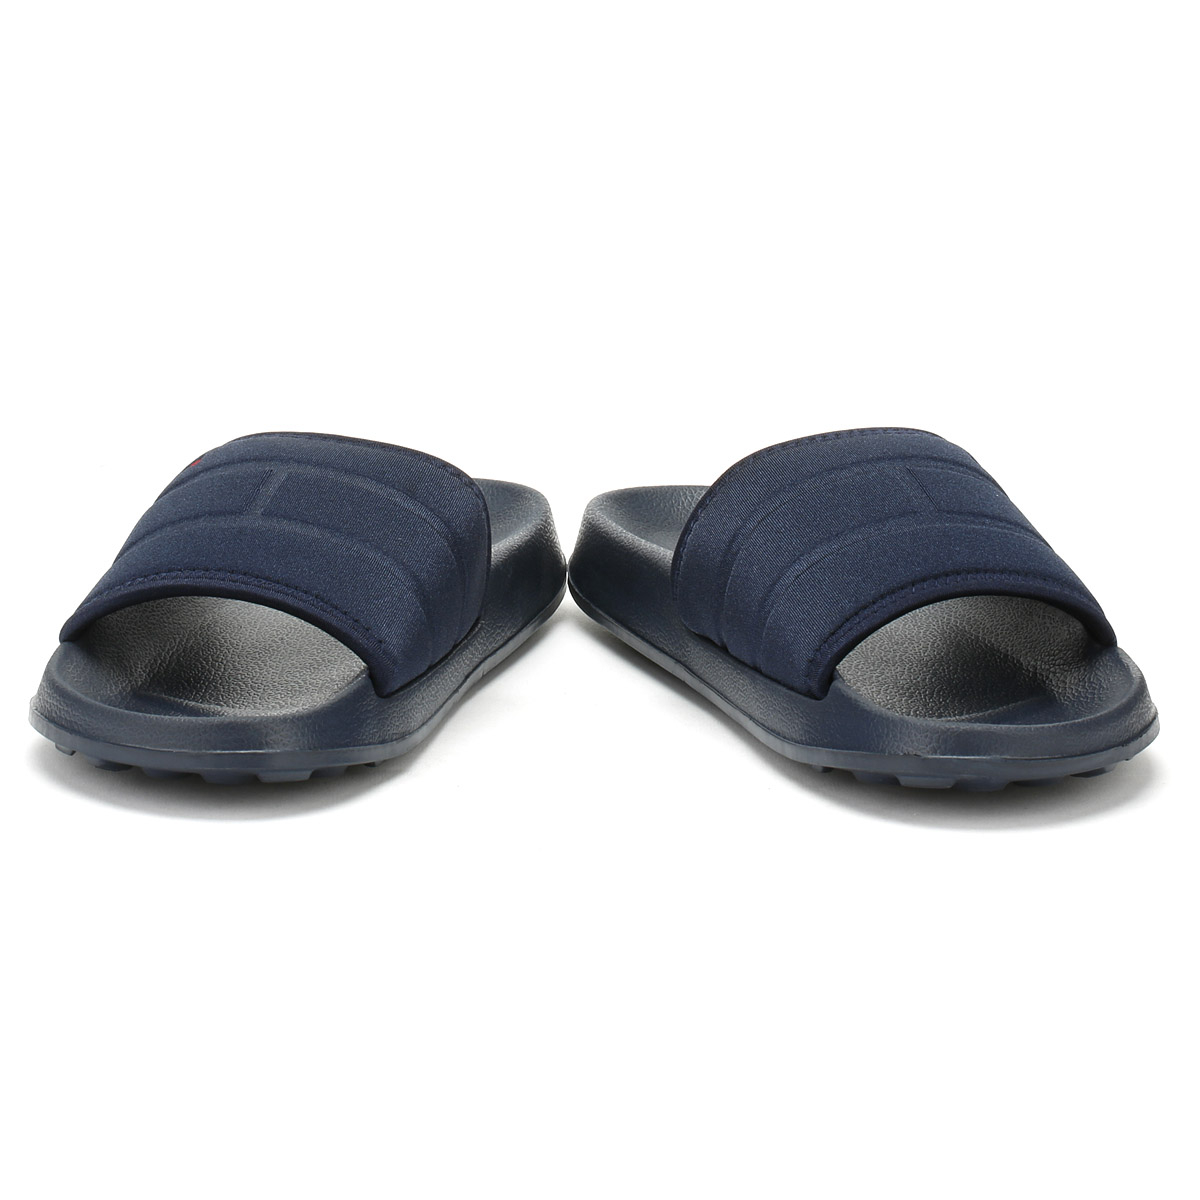 46141a6ed8b74 Tommy Hilfiger Mens Slides Midnight Navy Flag Pool Sandals Summer ...